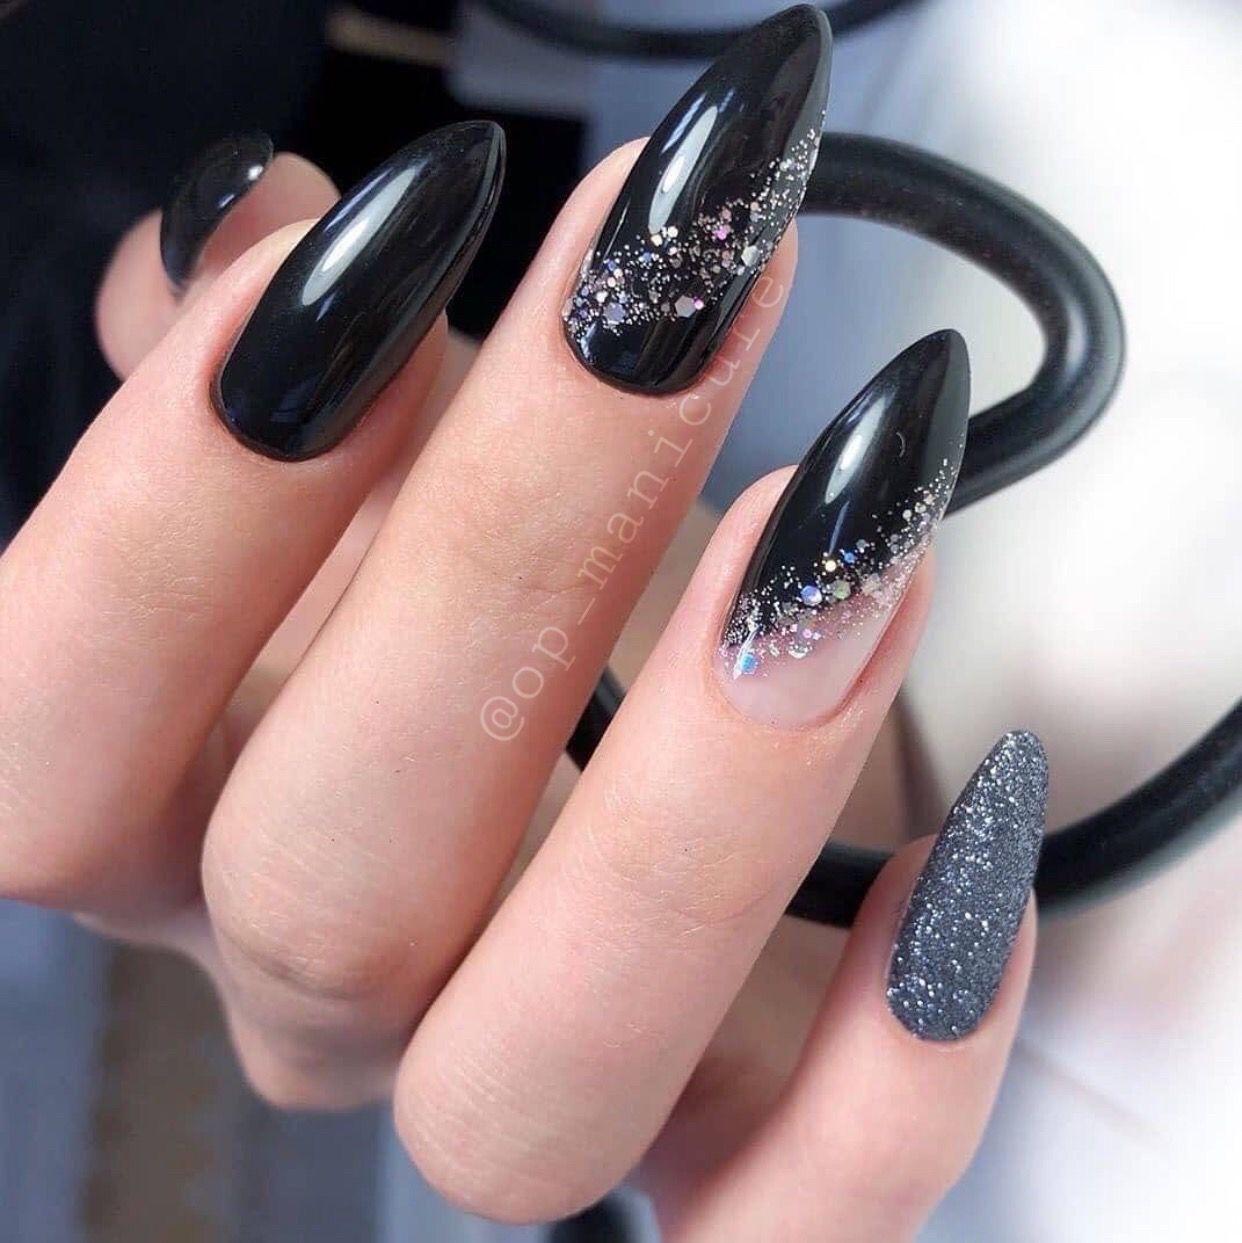 Pin By Z Petruzelkova On Zdena In 2020 Almond Nail Art Black Almond Nails Black Nail Designs